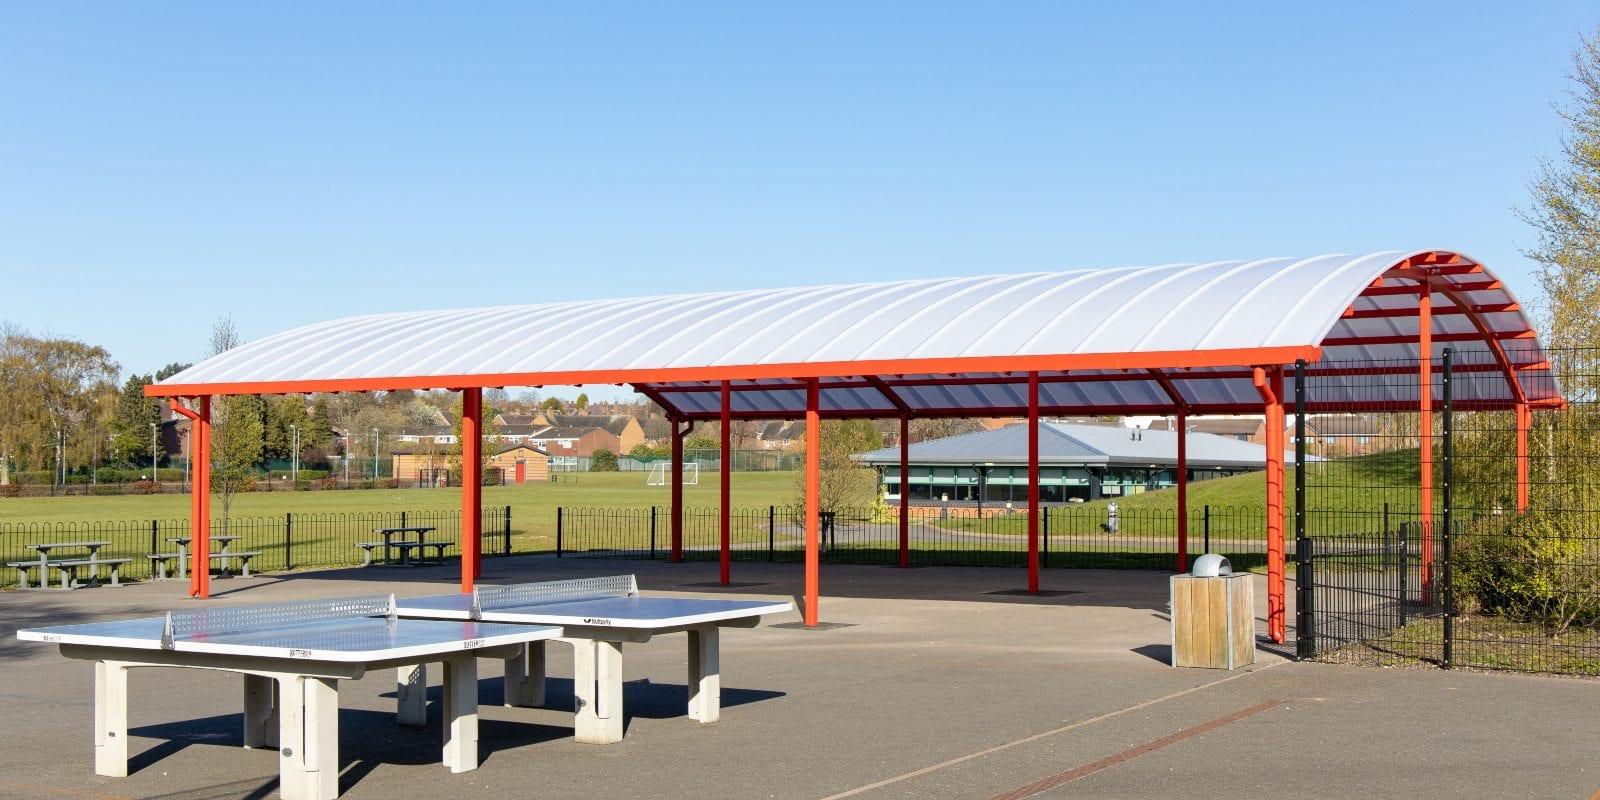 Dining area canopy we made for King Edward Sheldon Heath Academy